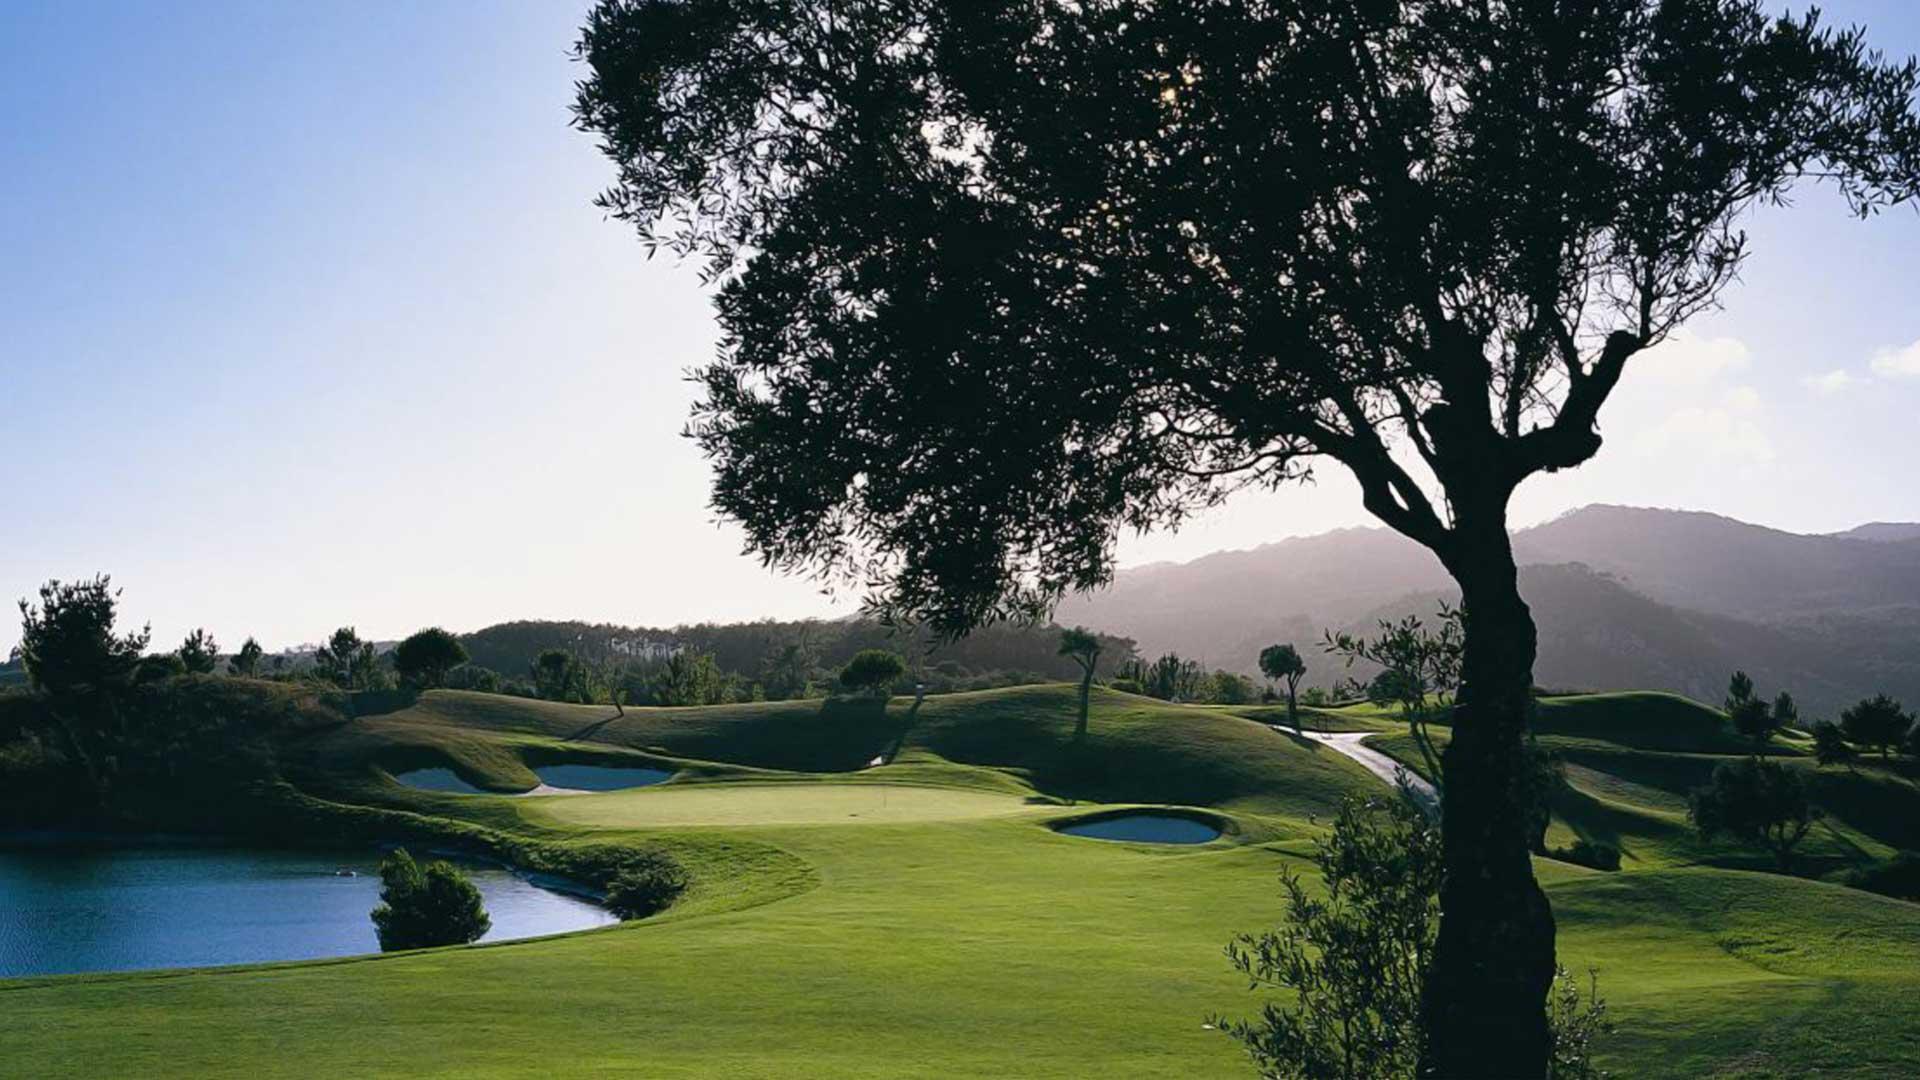 penha_longa_golf_course